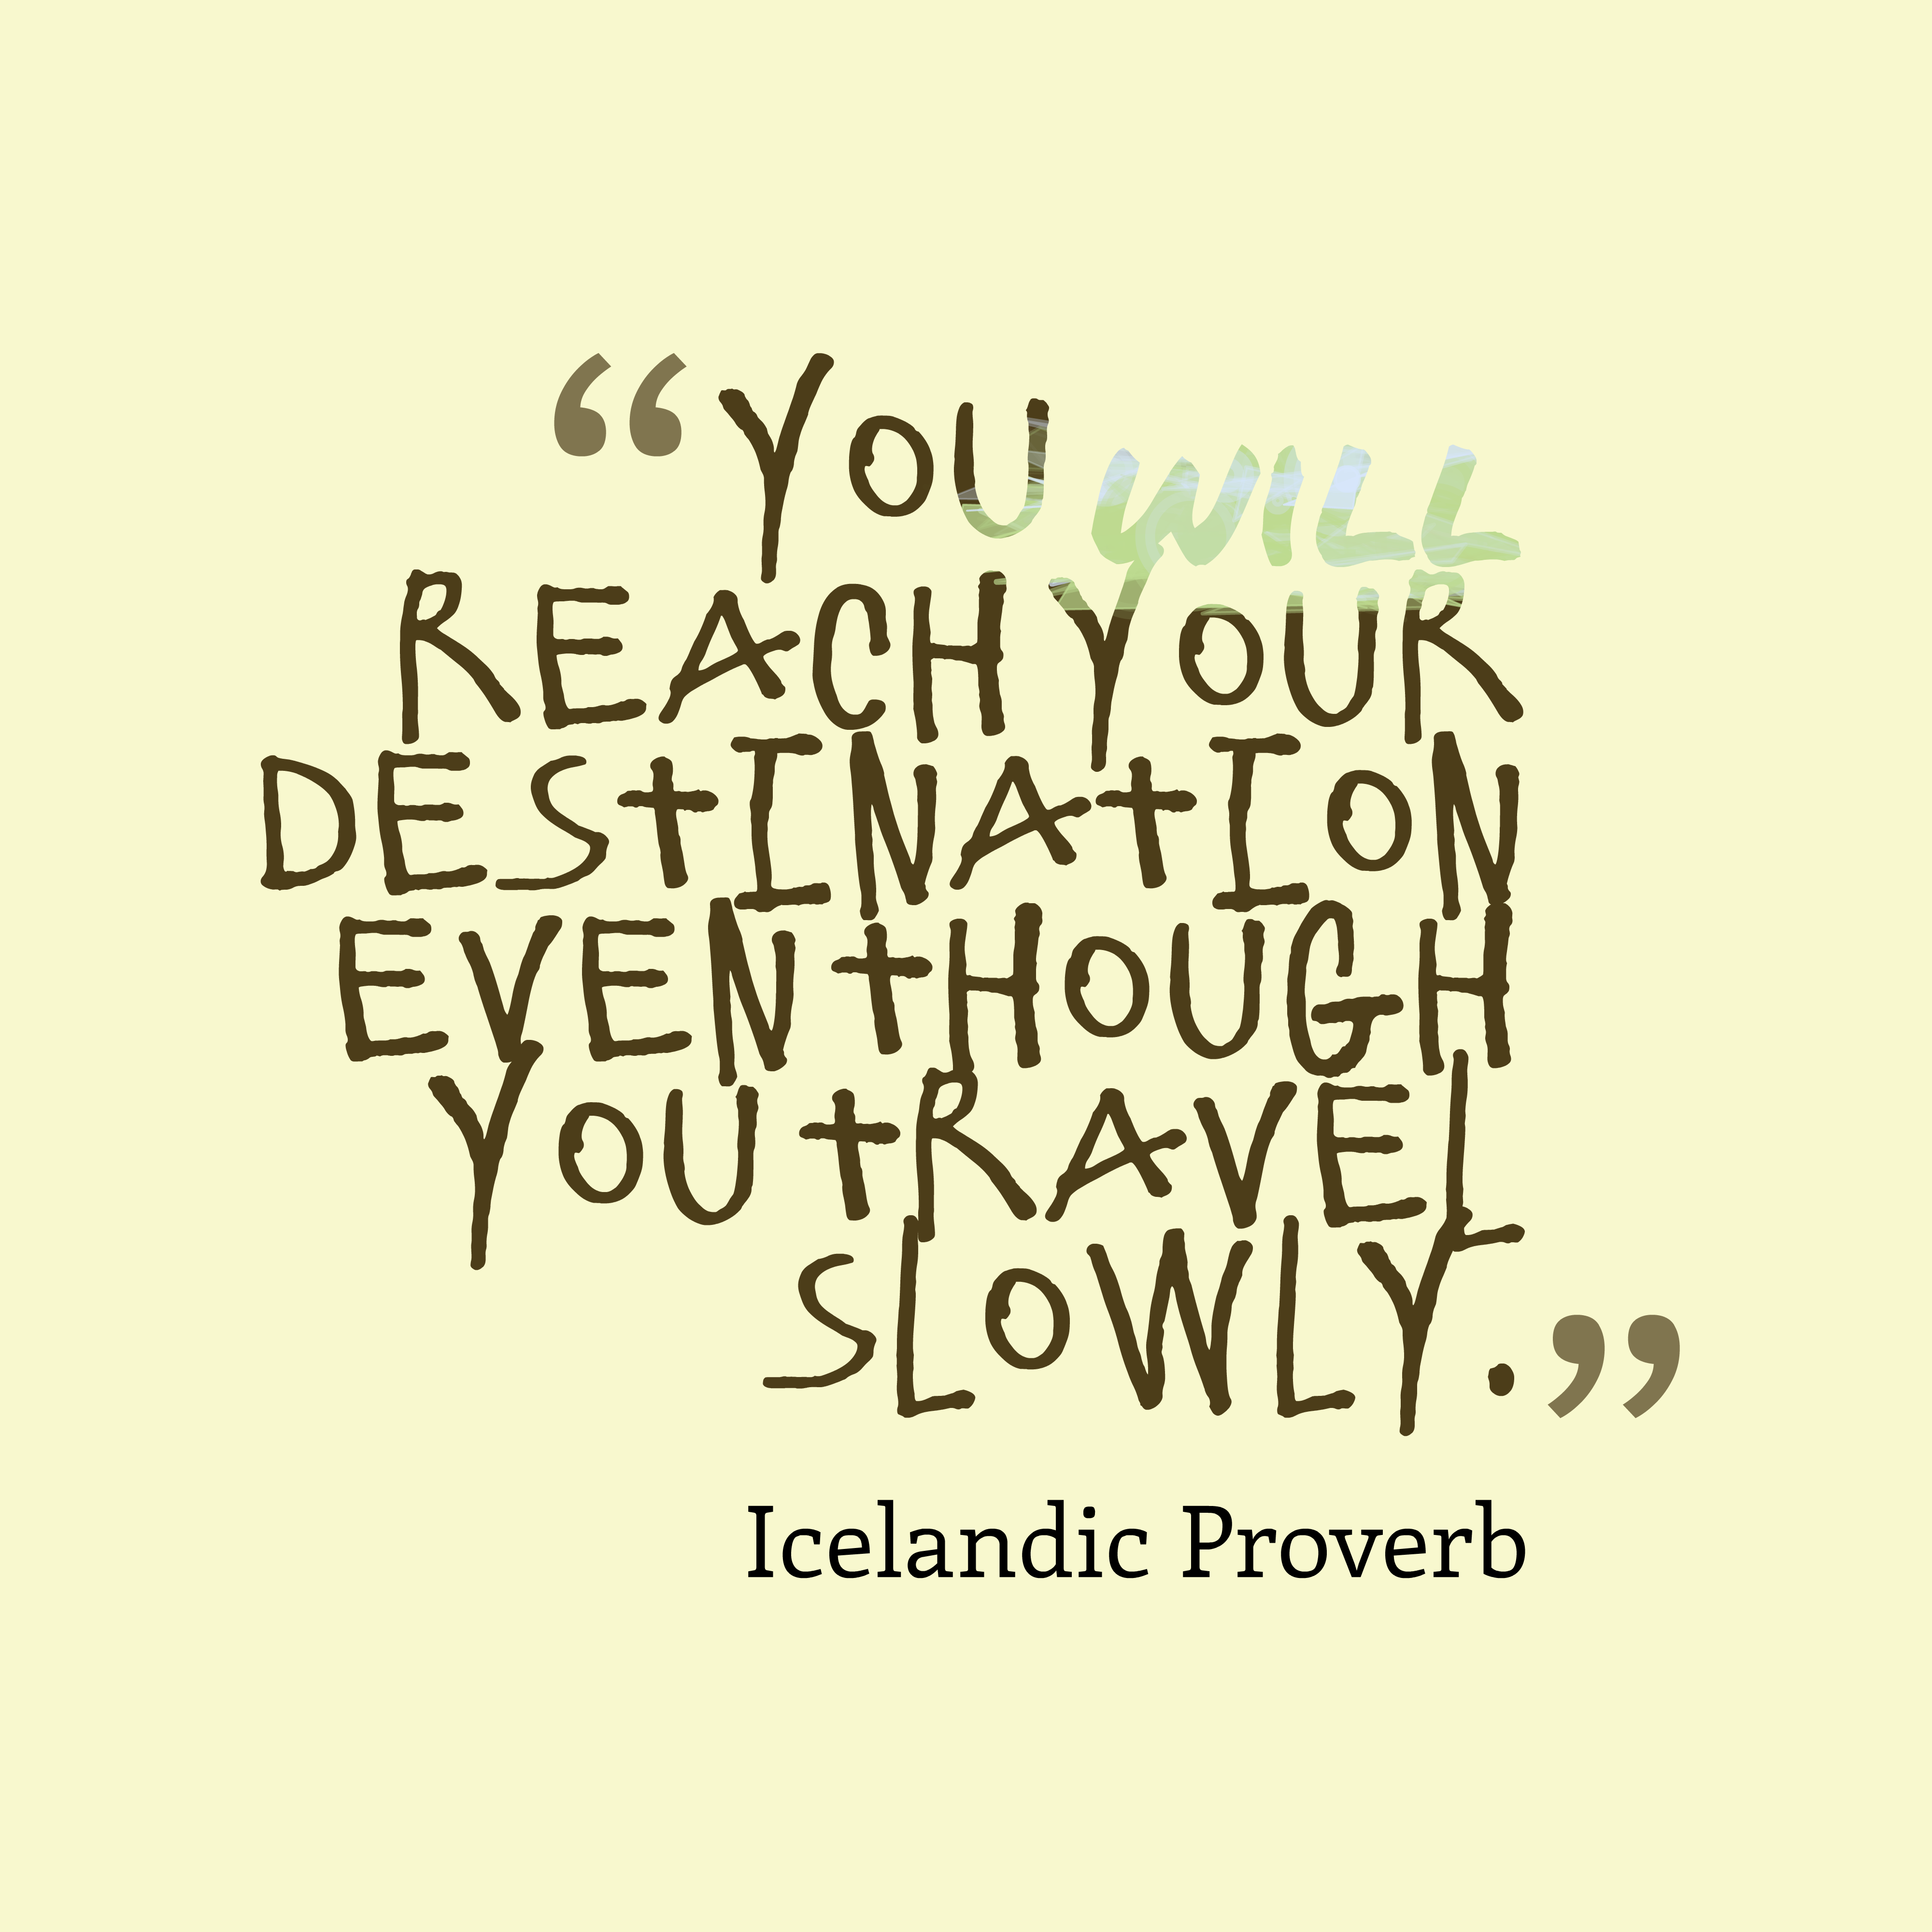 Icelandic Wisdom About Destination